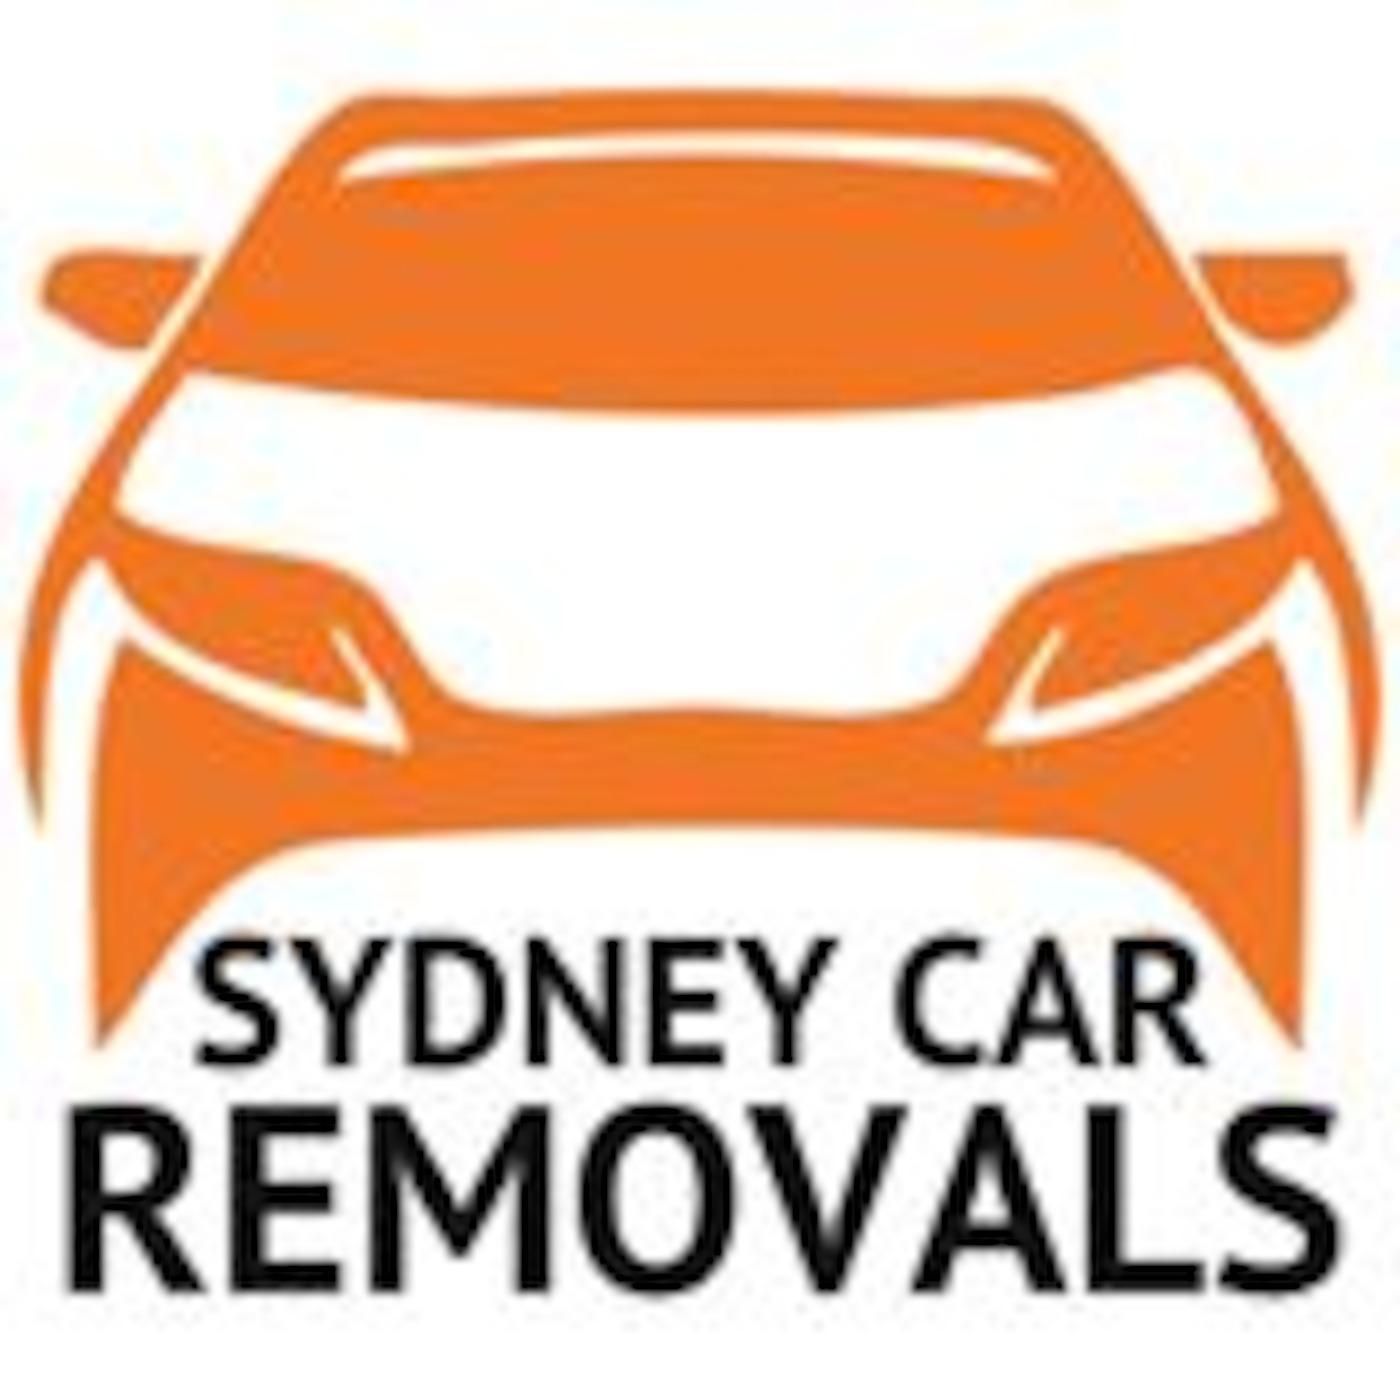 Sydney Car Removals - Sydney Car Removals (podcast)